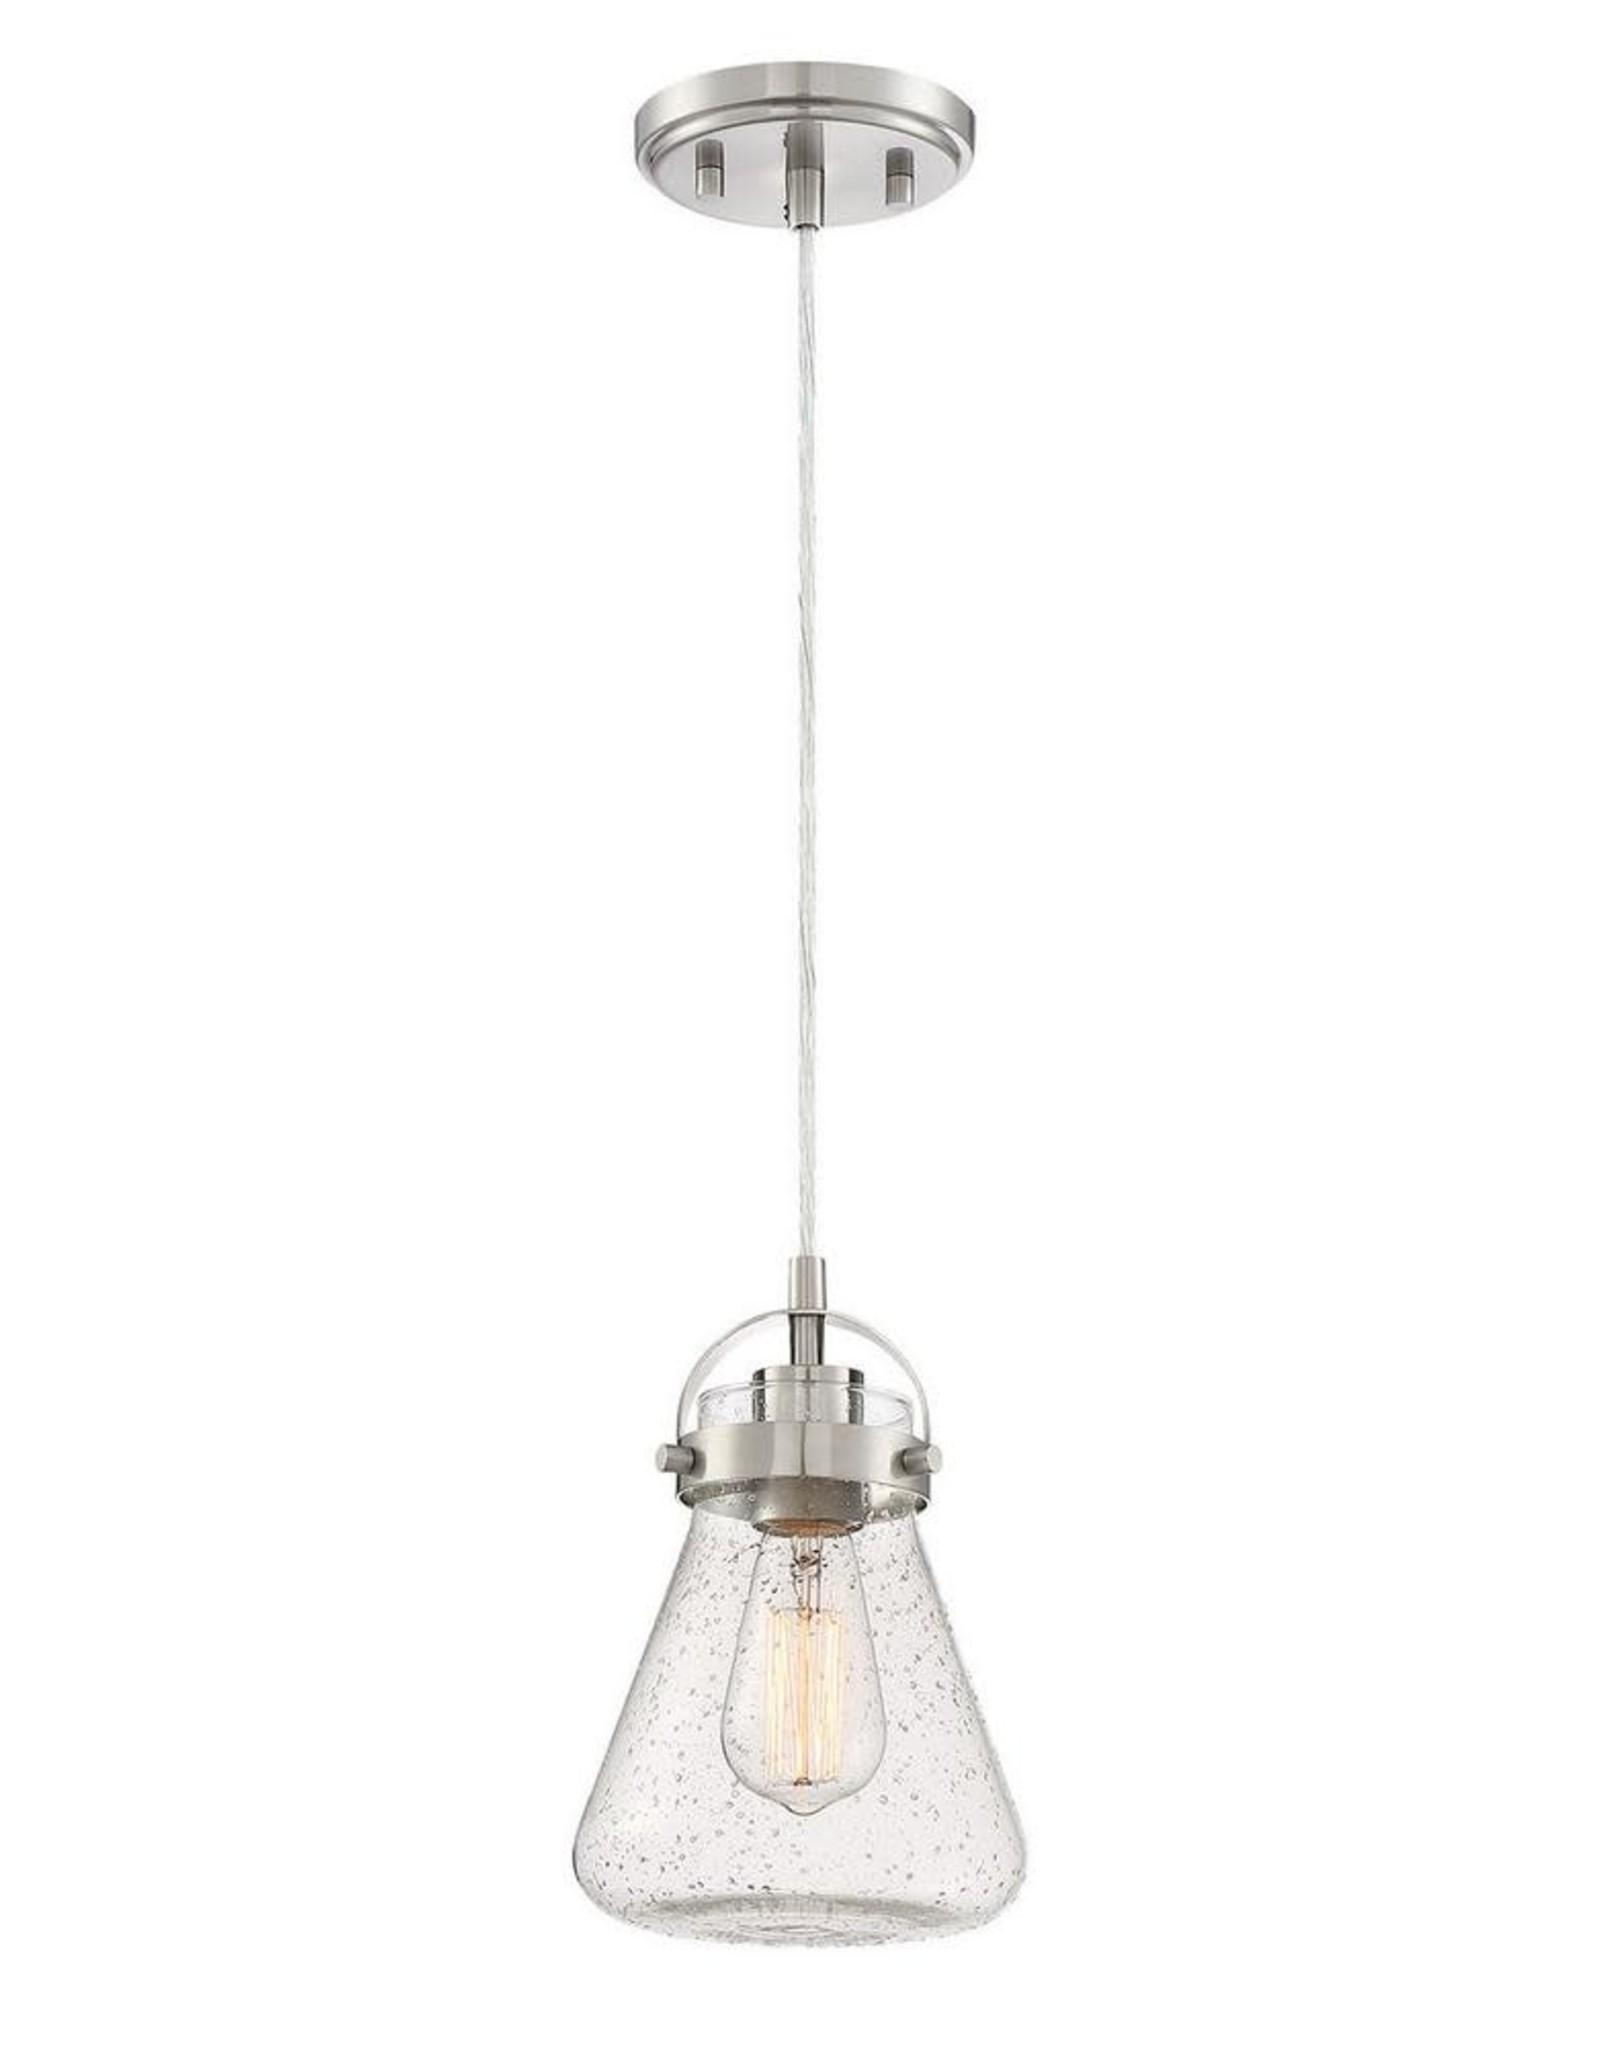 Home Decorators Collection 1-Light Brushed Nickel Mini Pendant